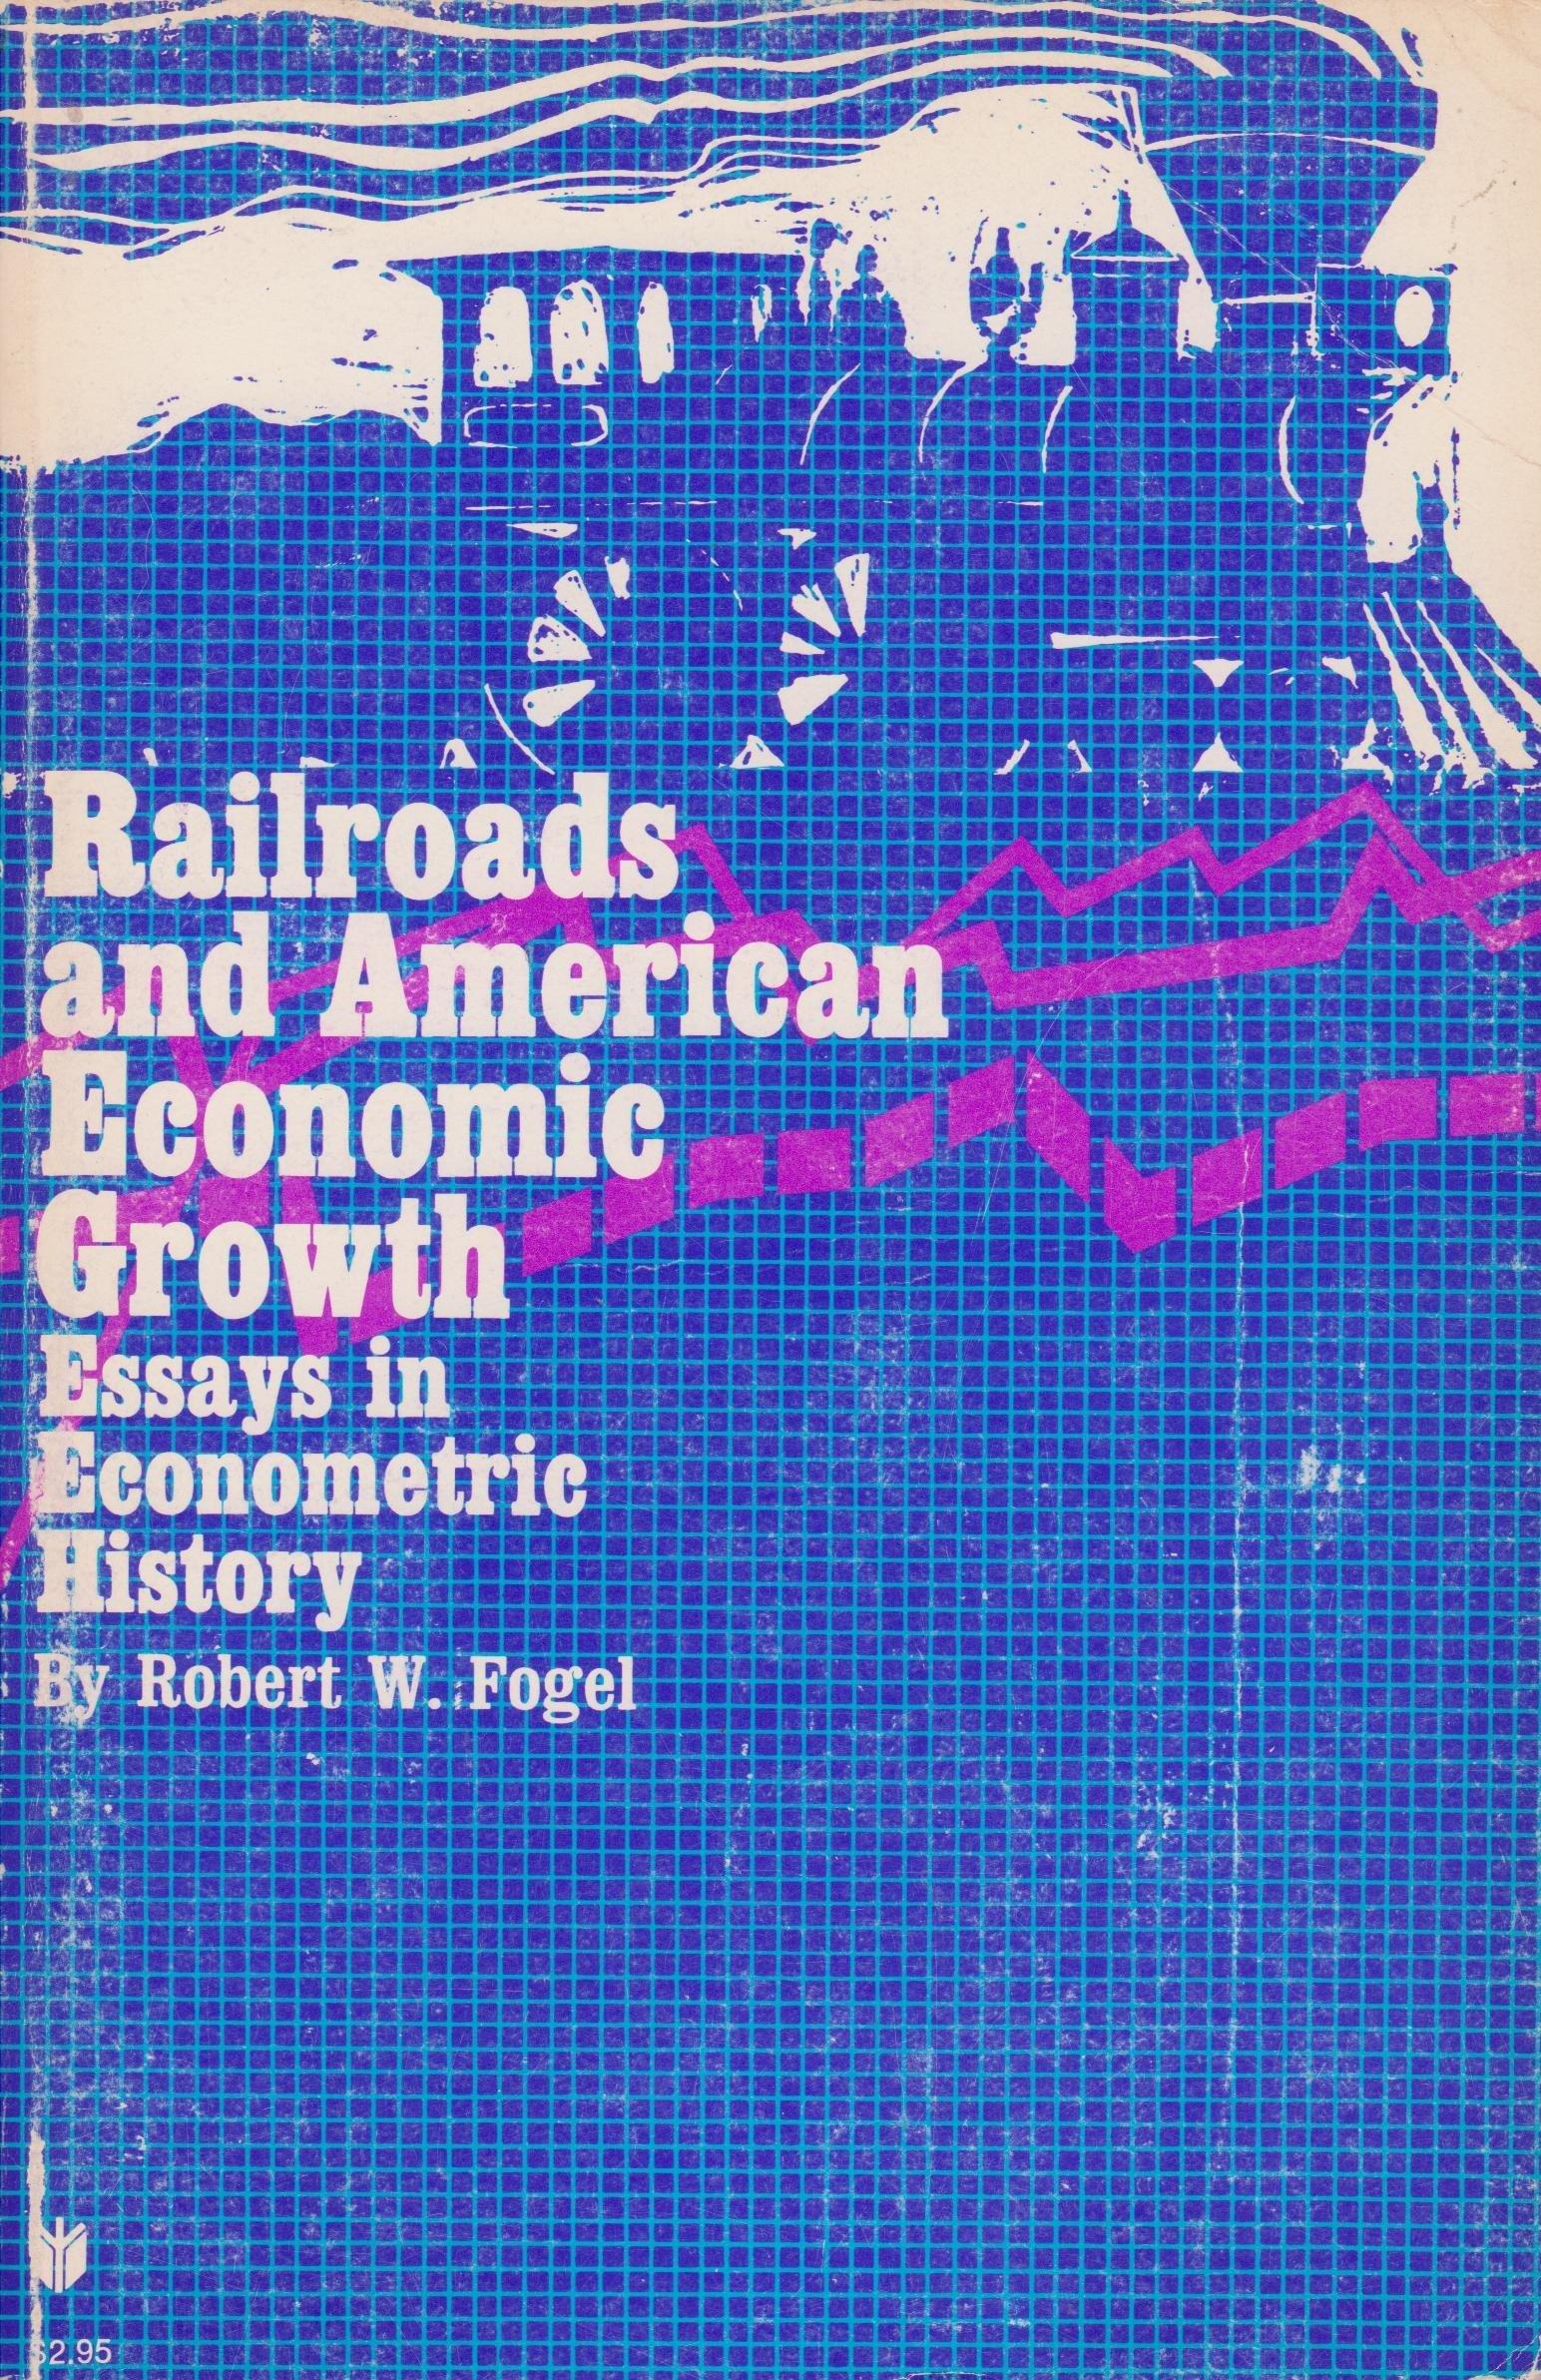 Railroads and American Economic Growth: Essays in Econometric History